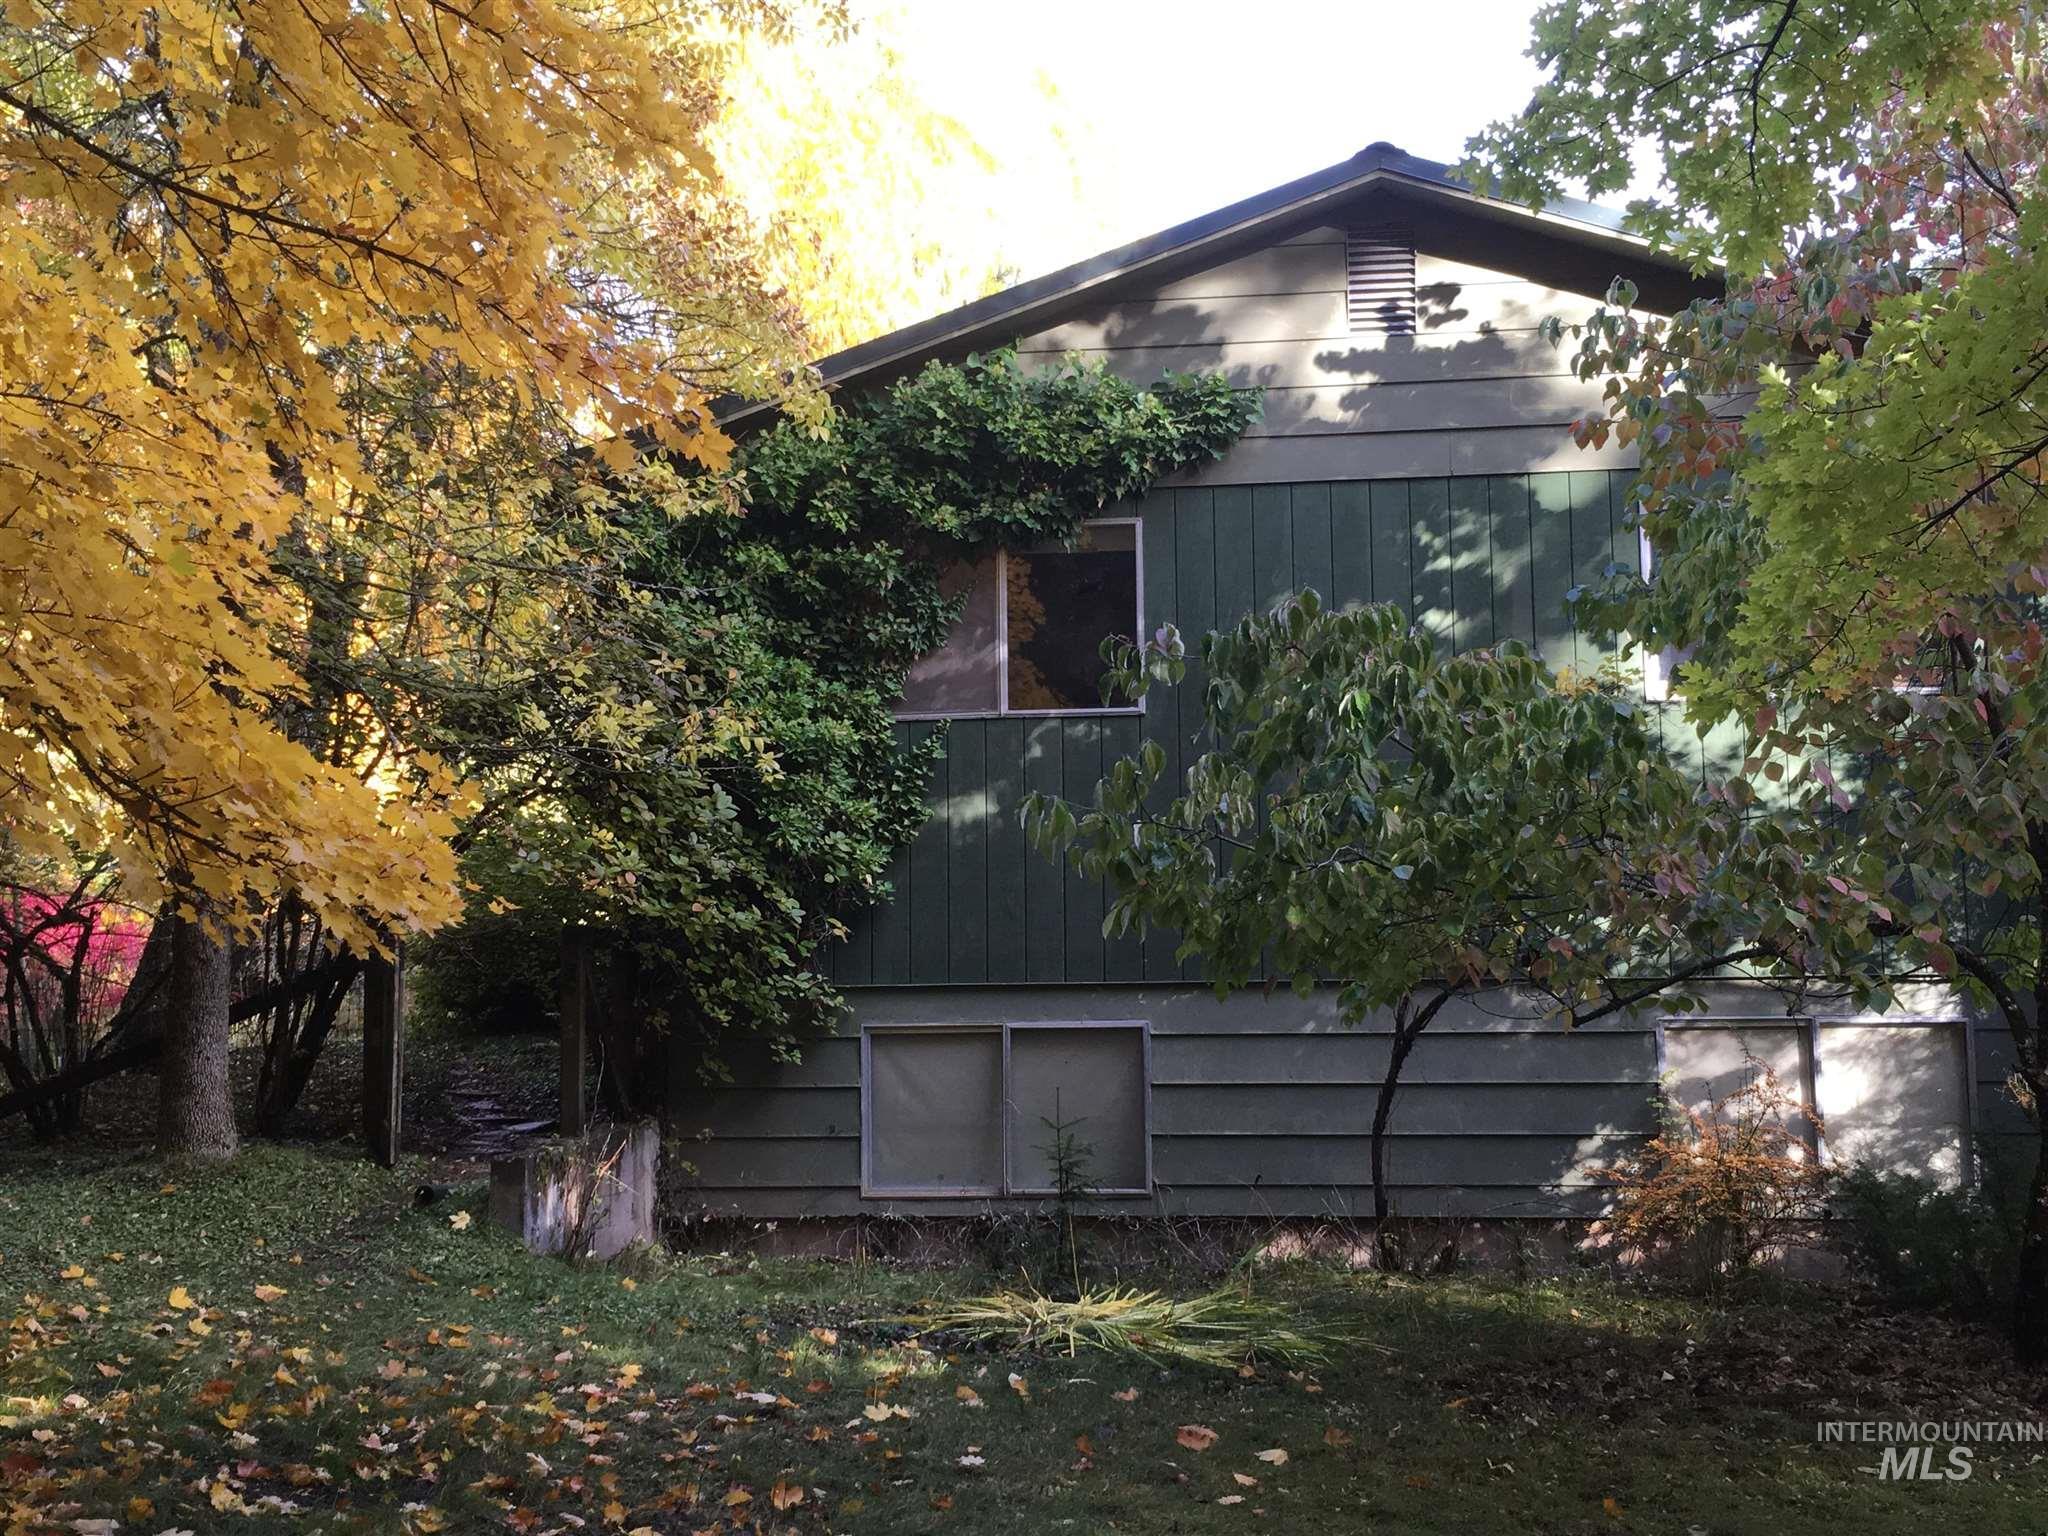 127 Crane Hill Rd Property Photo - Kooskia, ID real estate listing